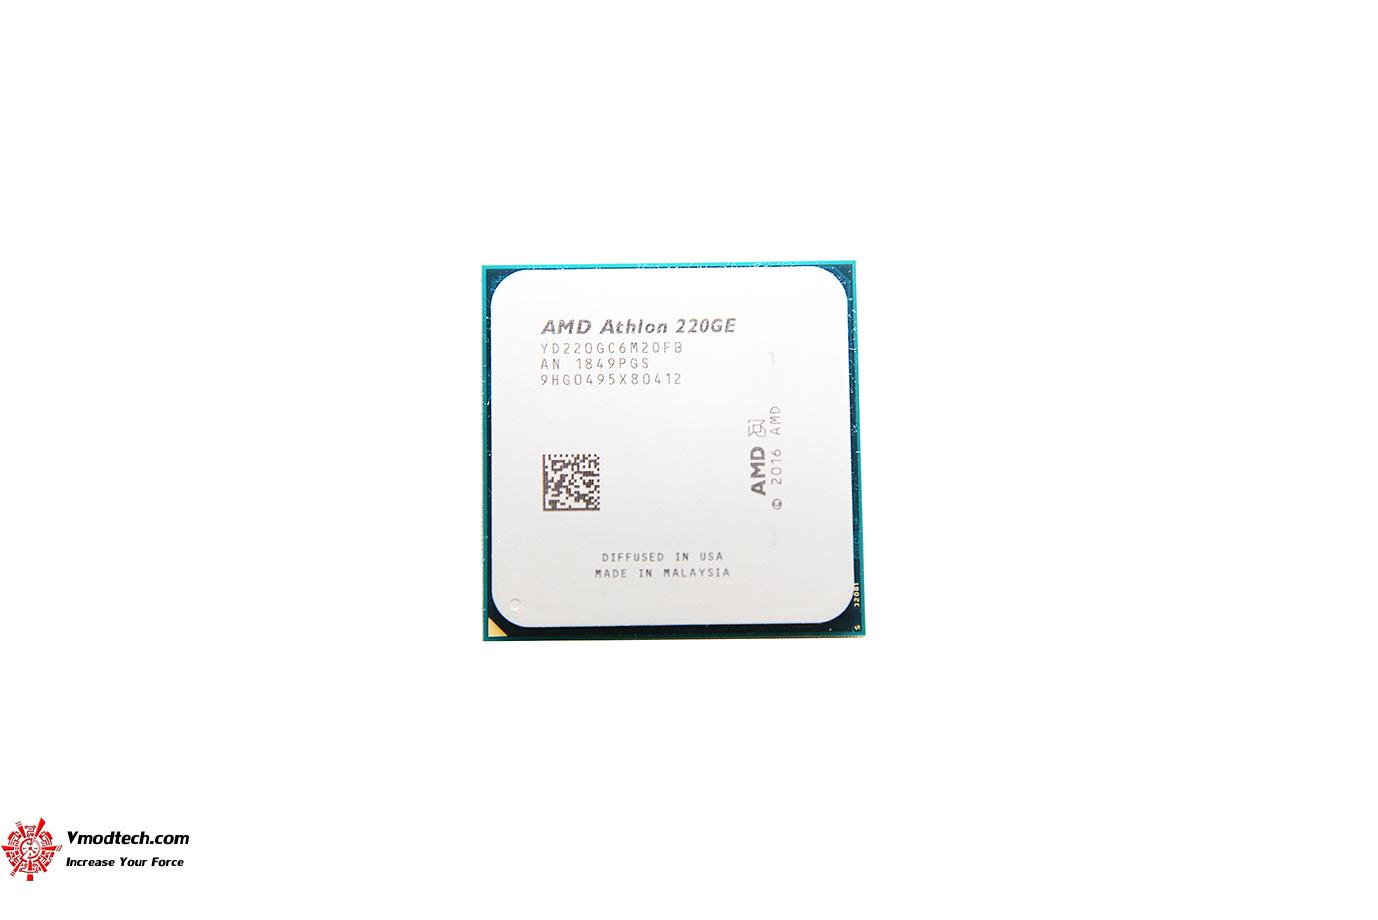 dsc 9689 AMD Athlon 220GE Processor with Radeon Vega 3 Graphics Review